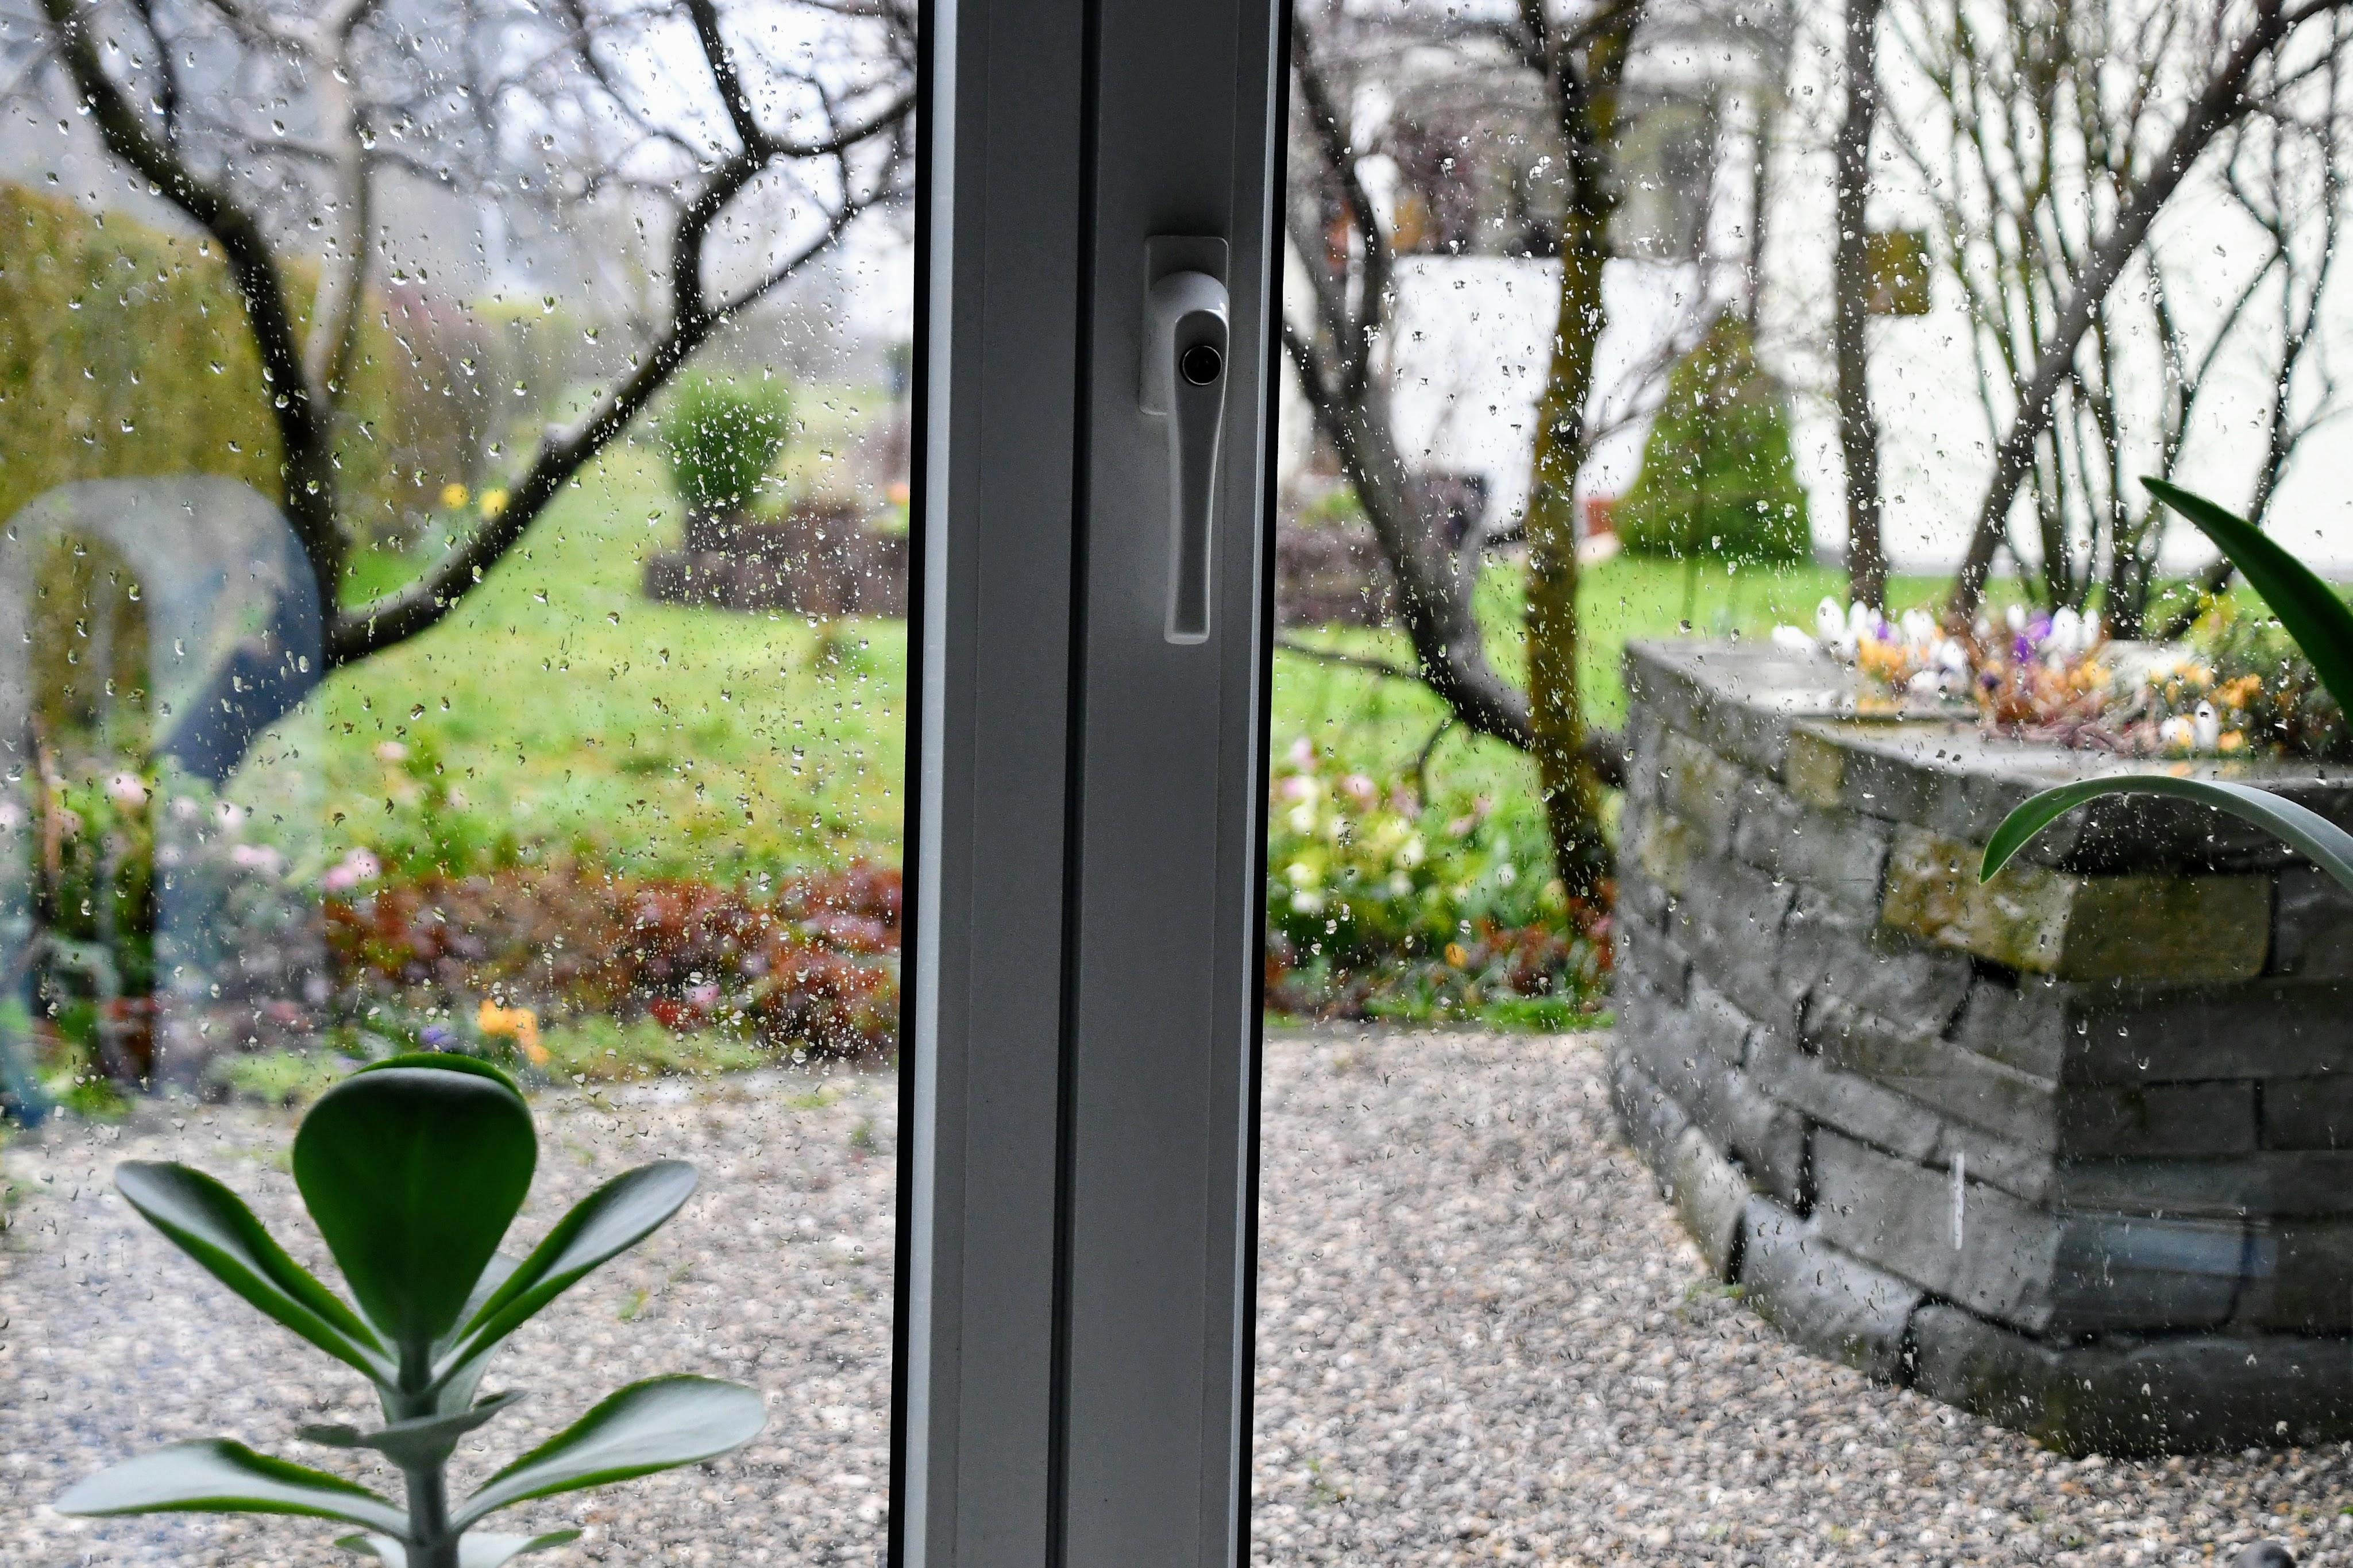 a-rainy-day-in-garden-10.03.2020